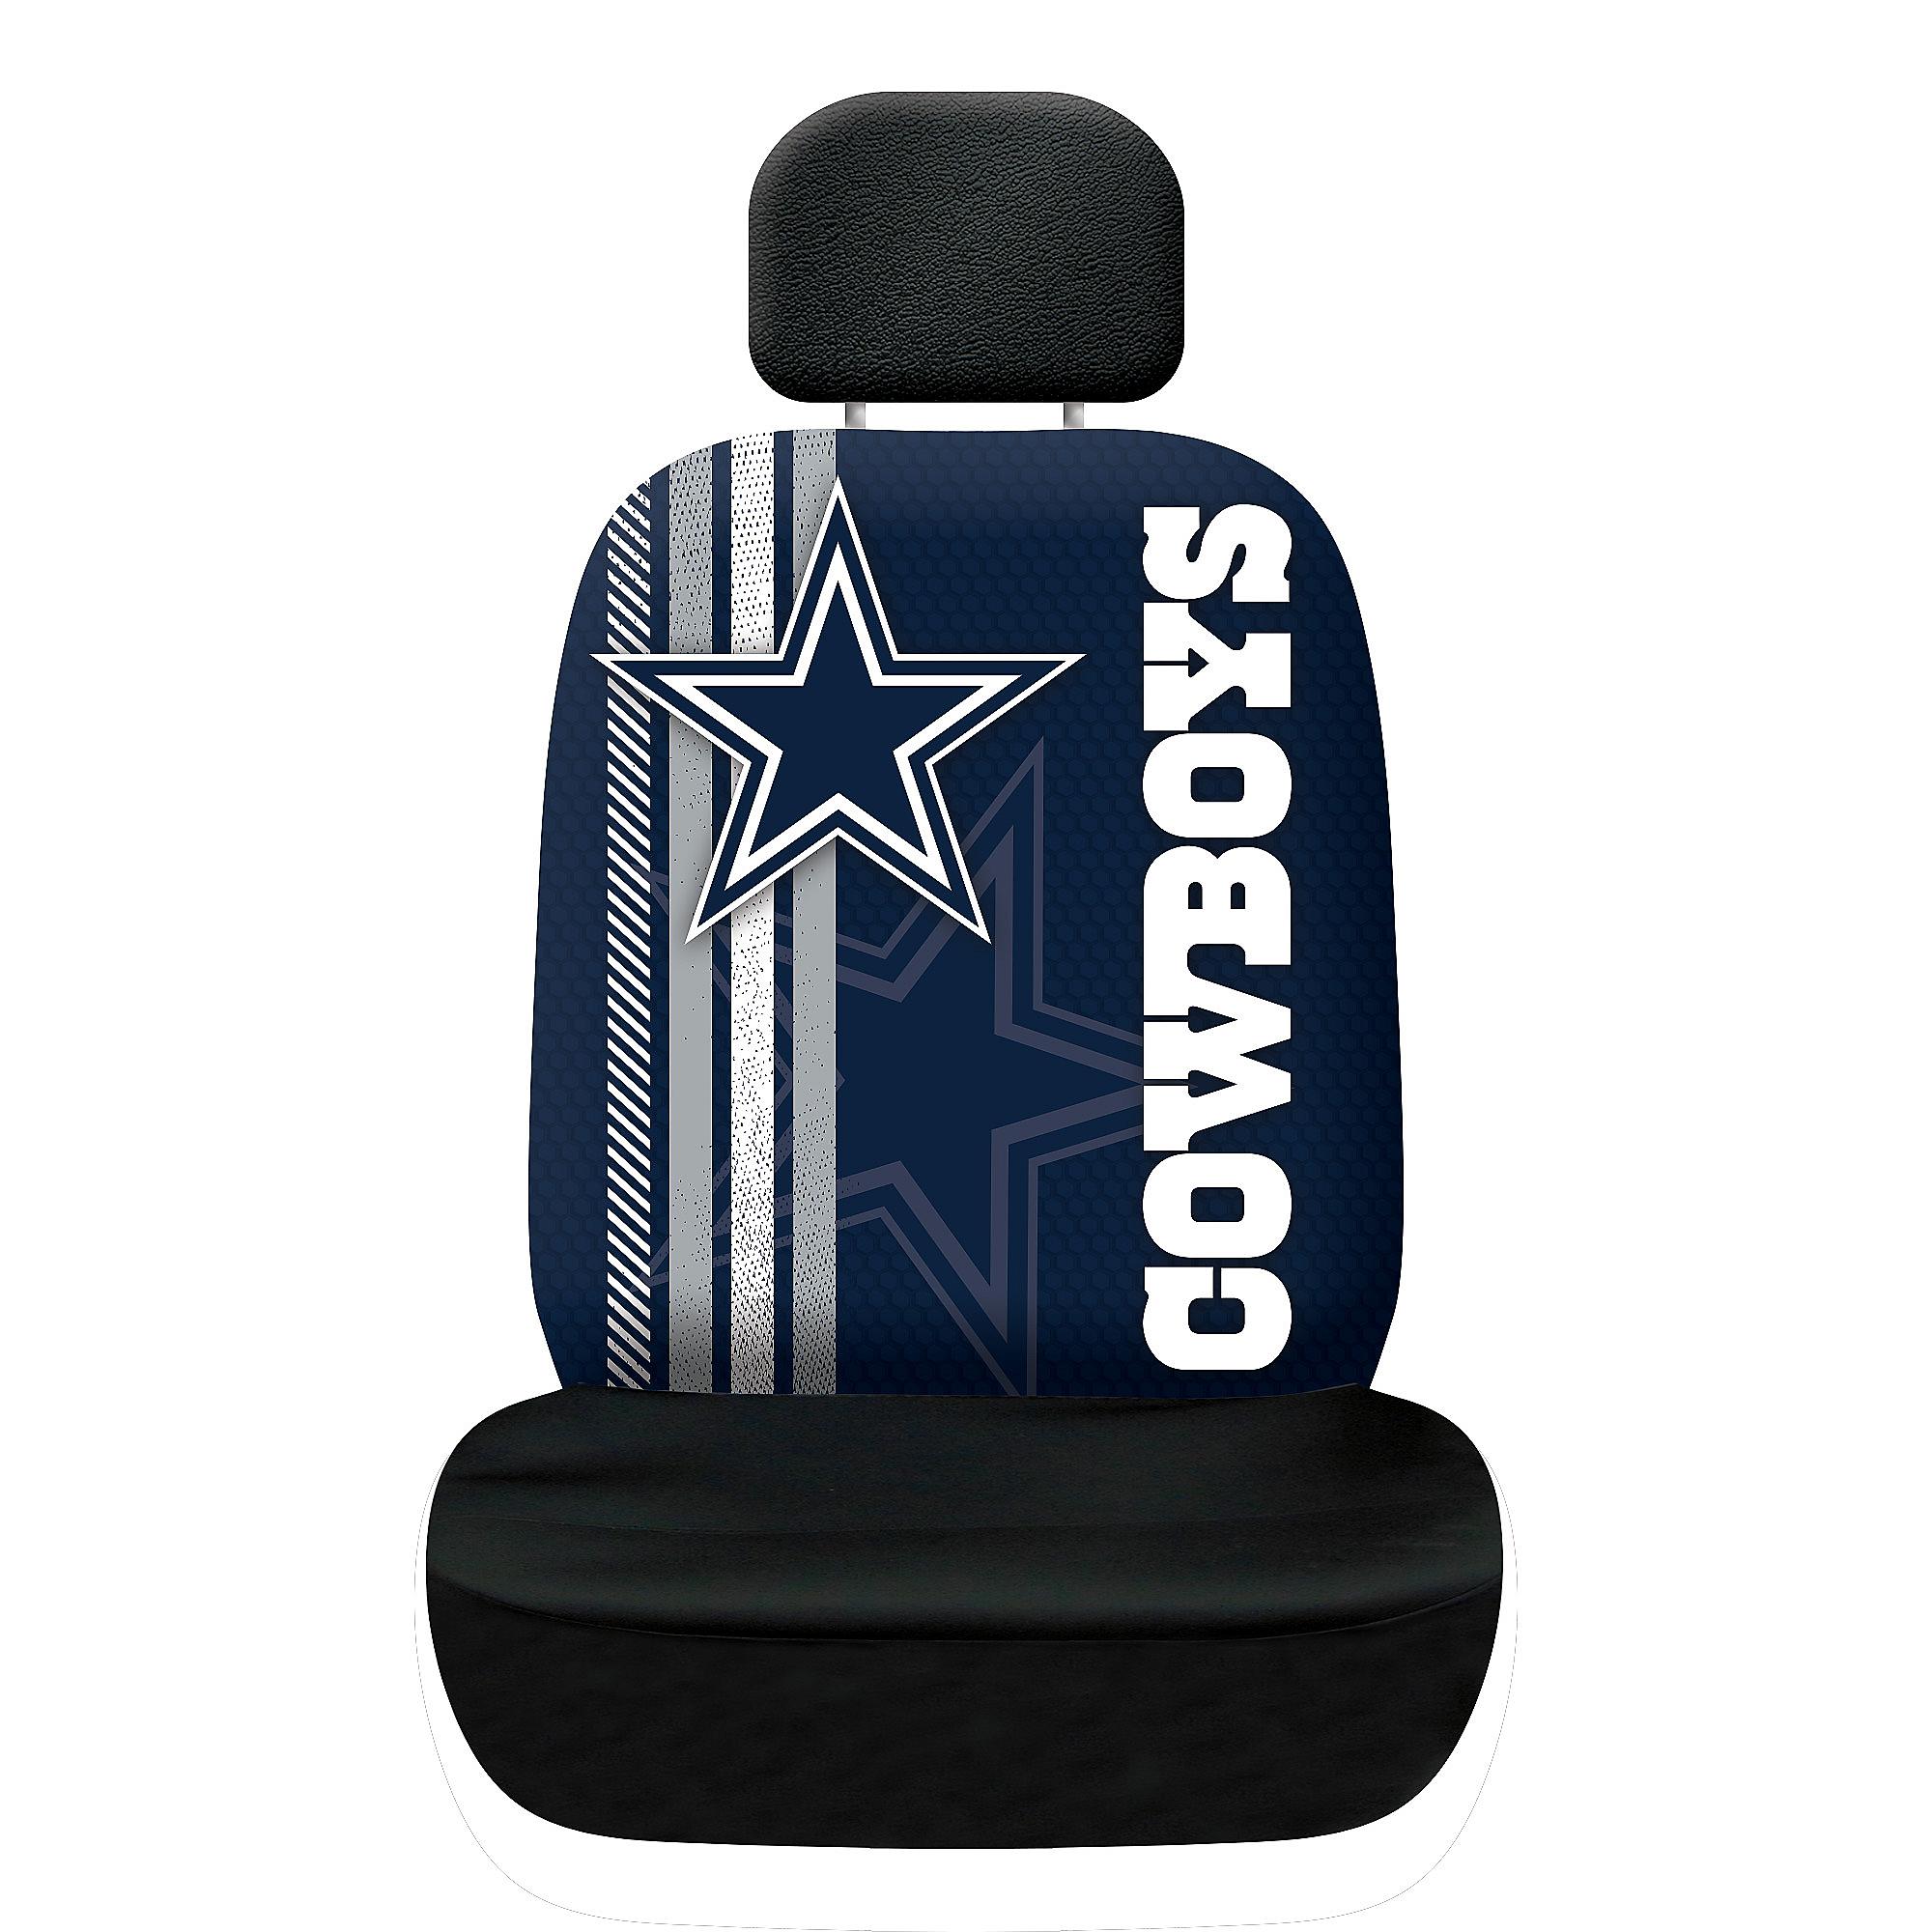 Dallas Cowboys Rally Seat Cover